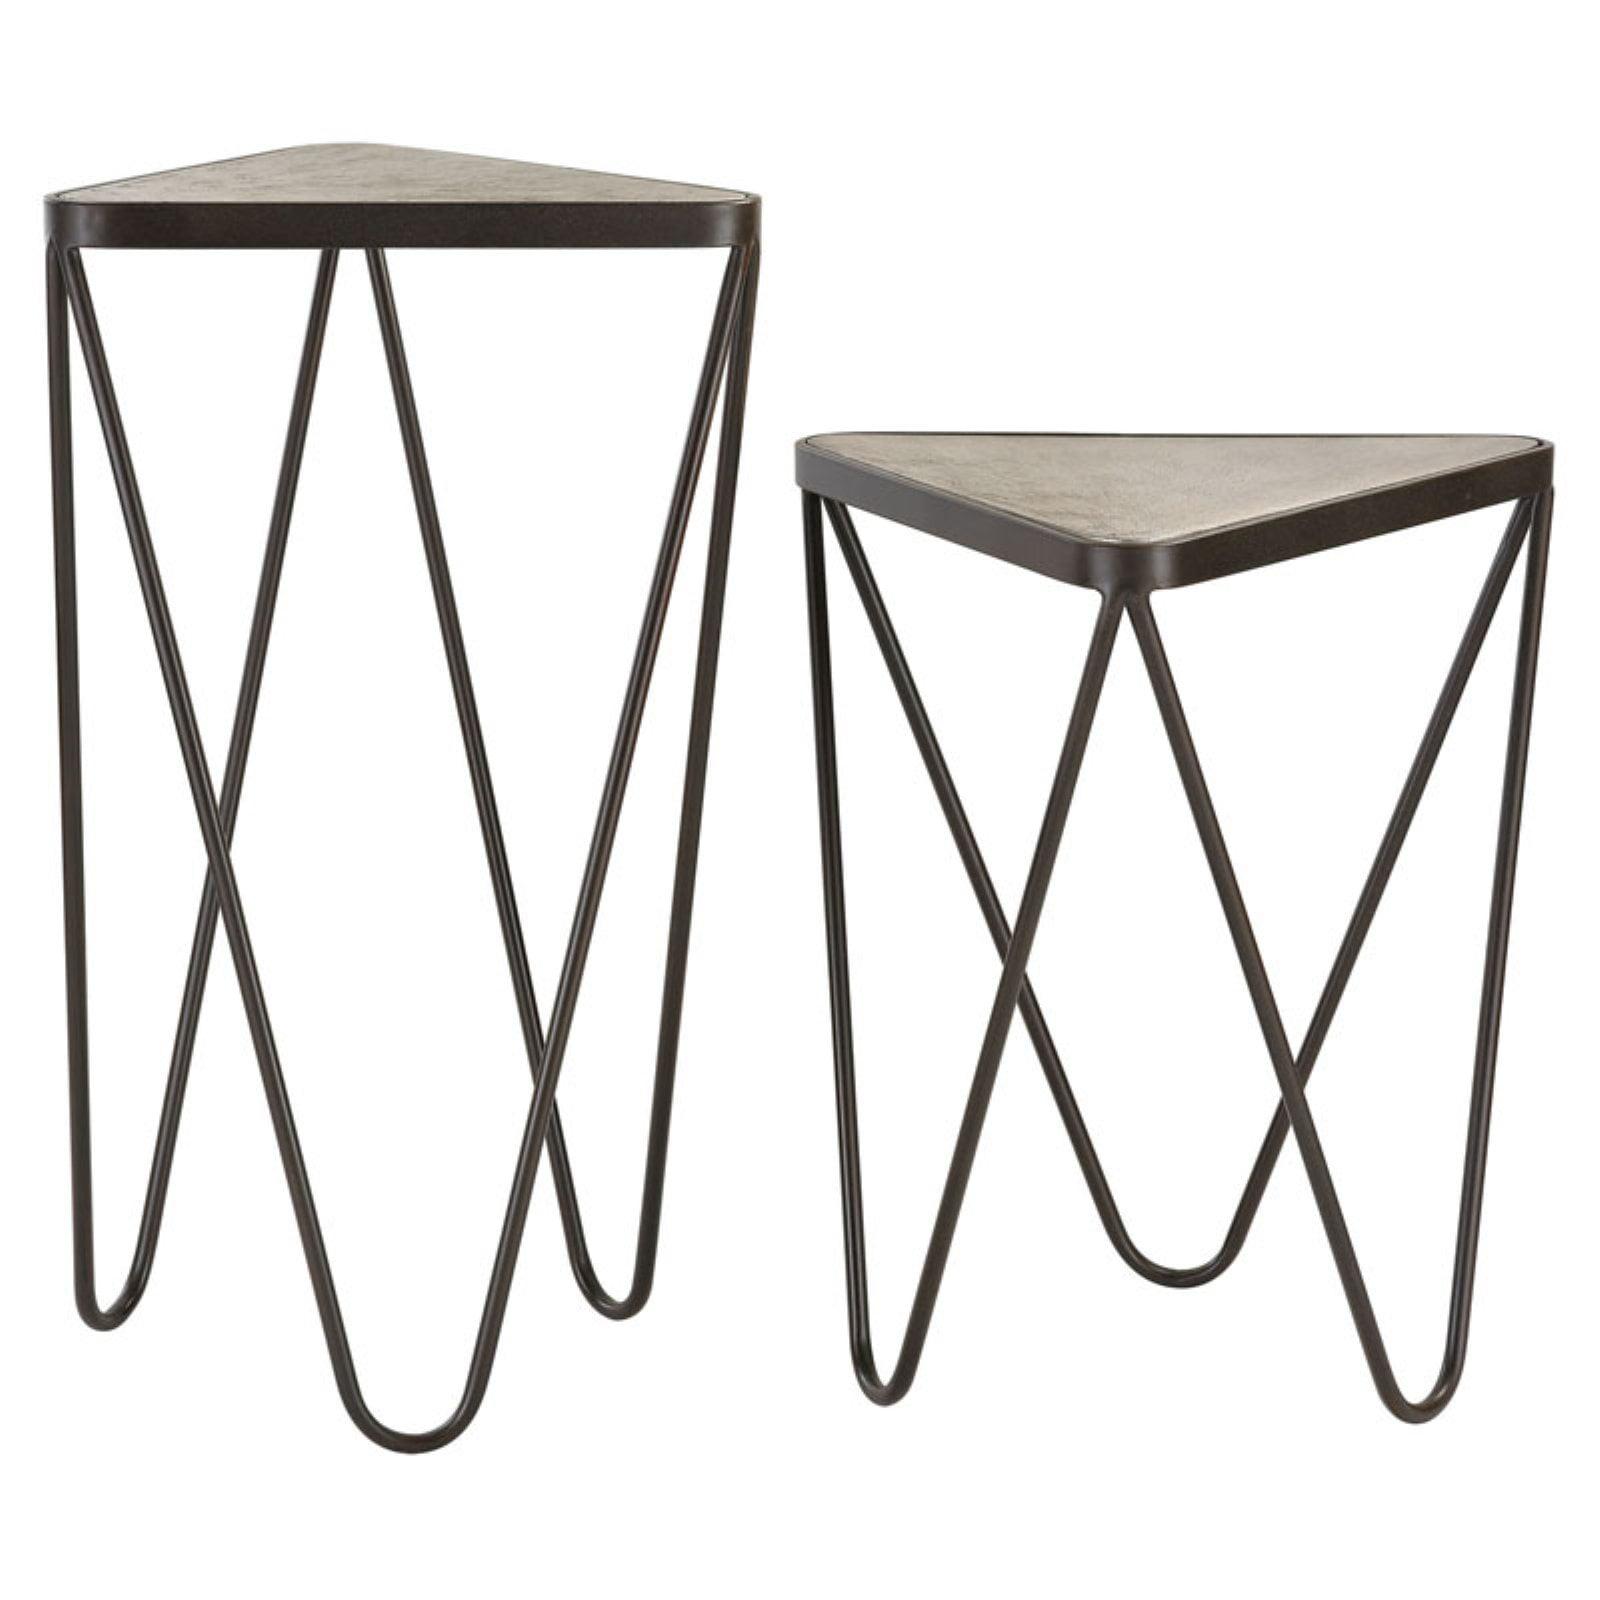 Elk Lighting Angular Side Table Set of 2 by Sterling